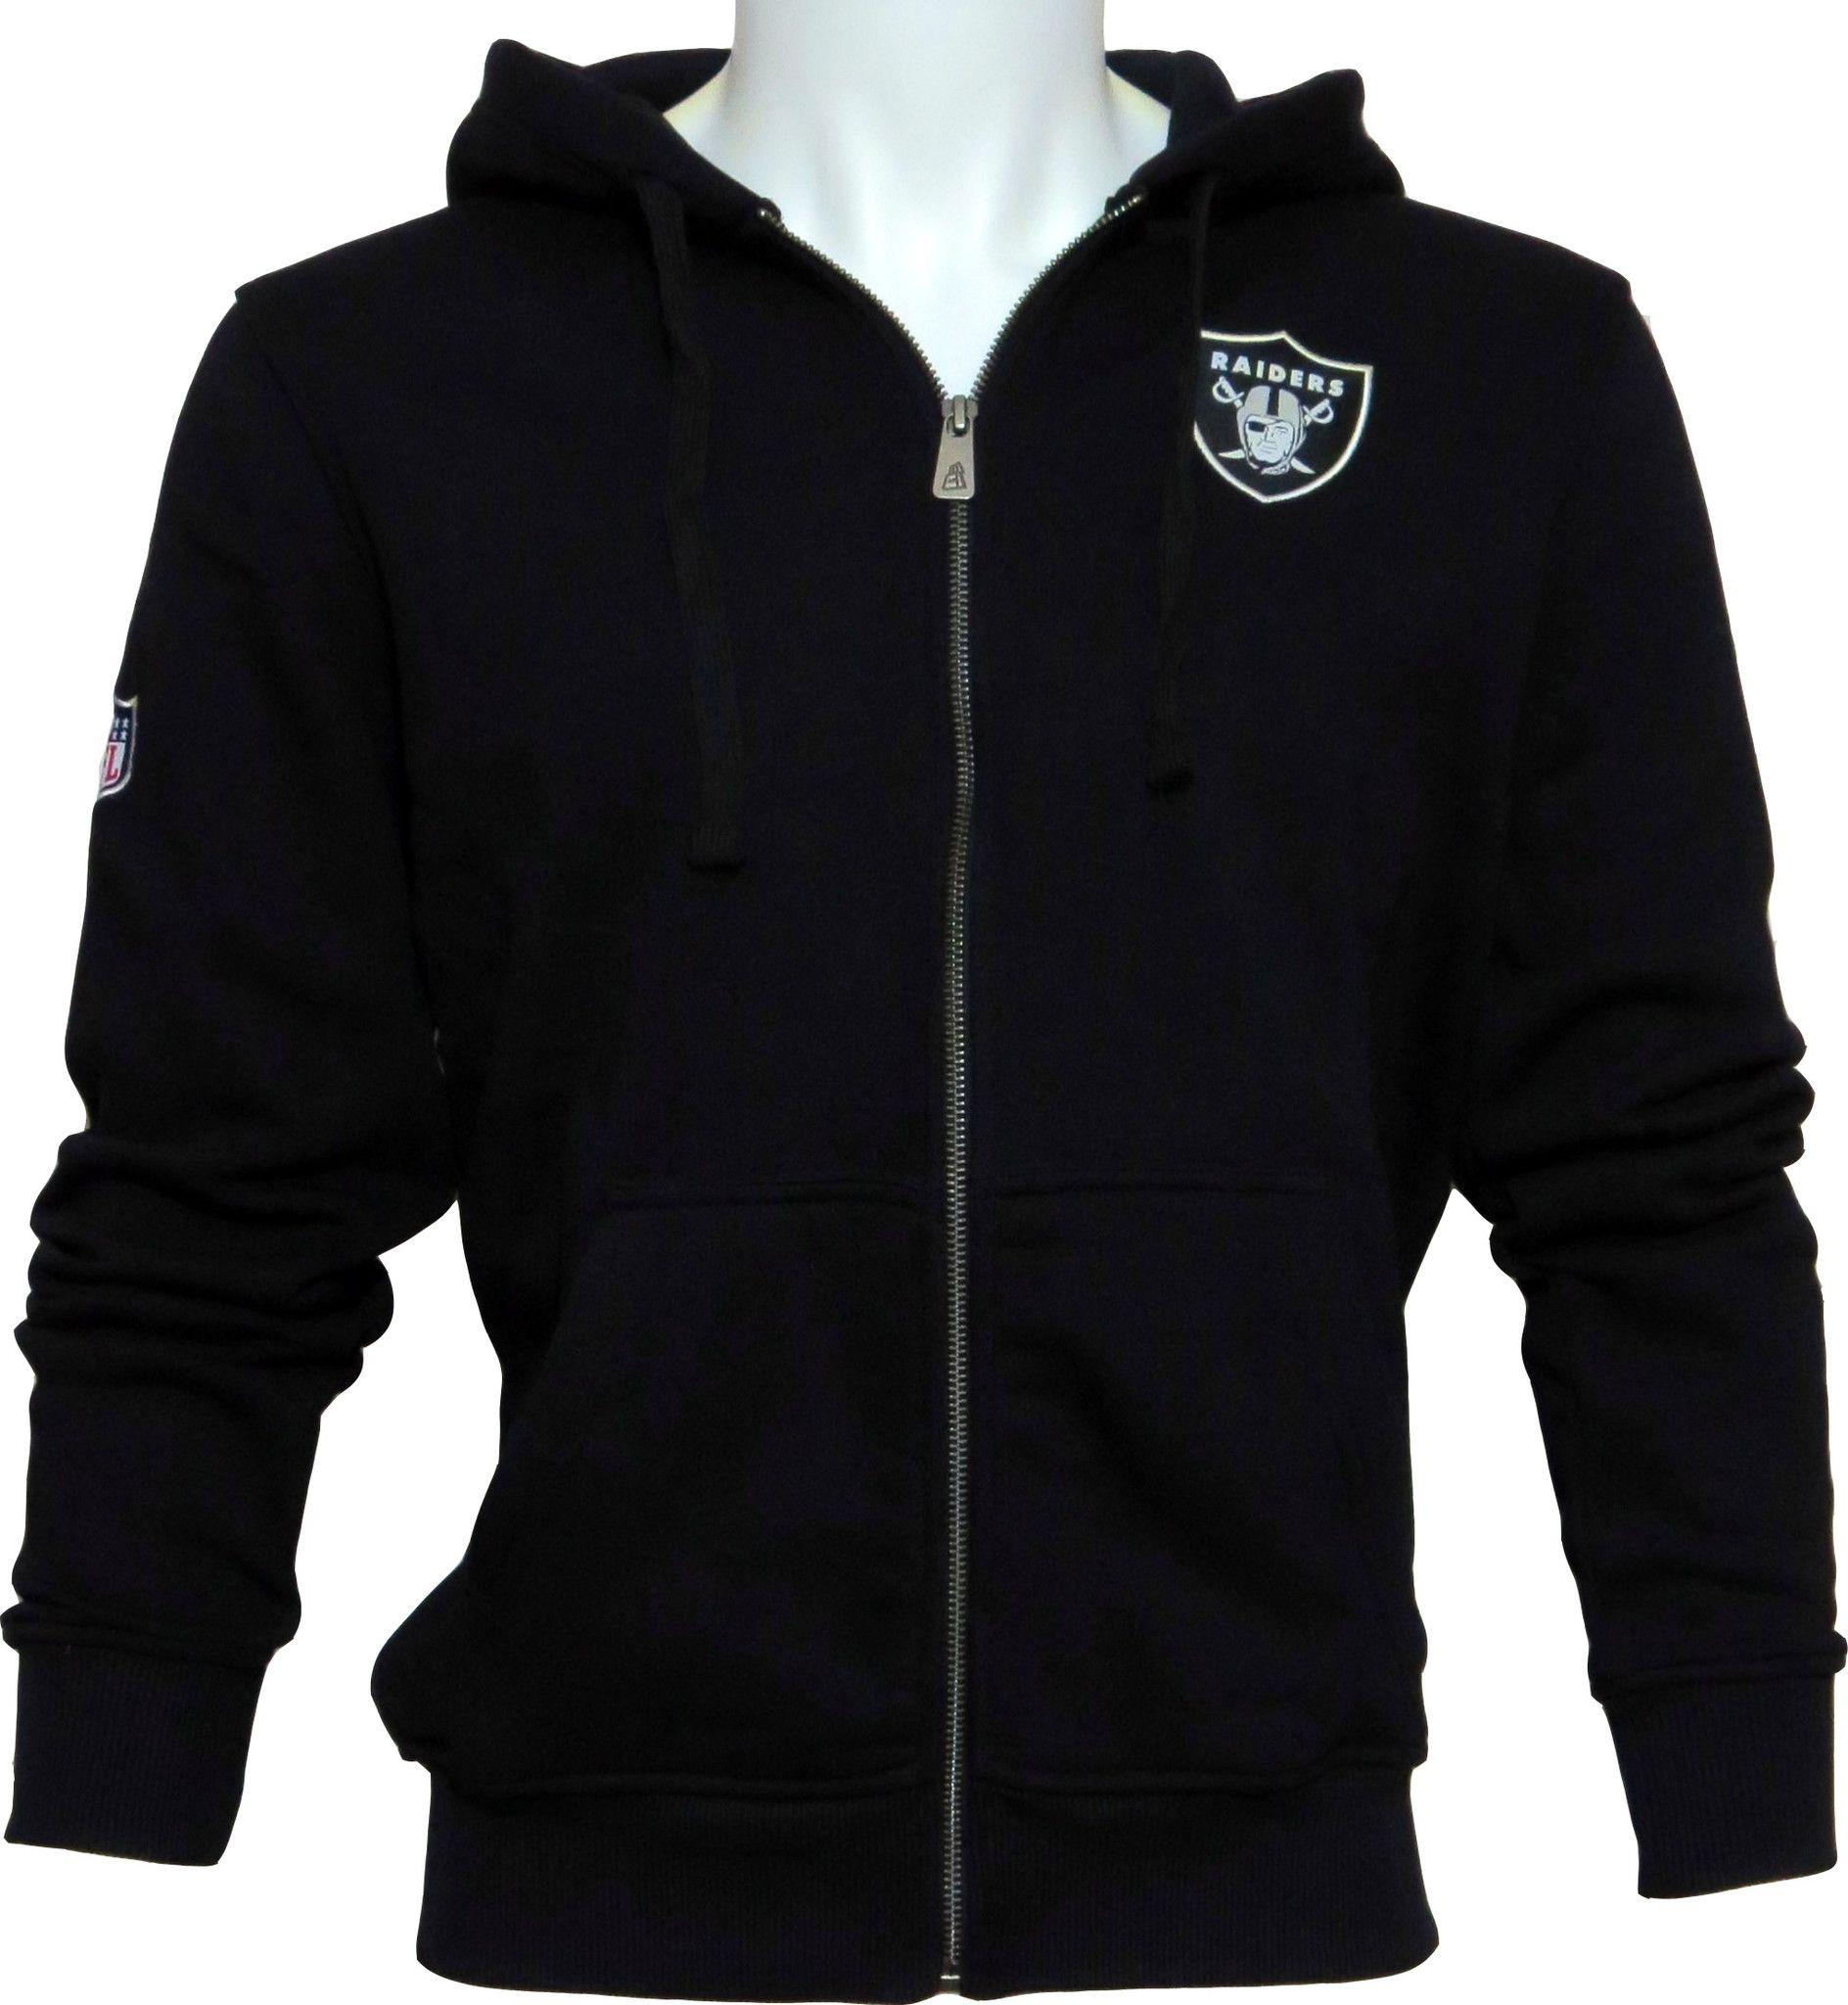 promo code f1847 b2331 Oakland Raiders New Era NFL Zip Up Hooded Team Track Top ...